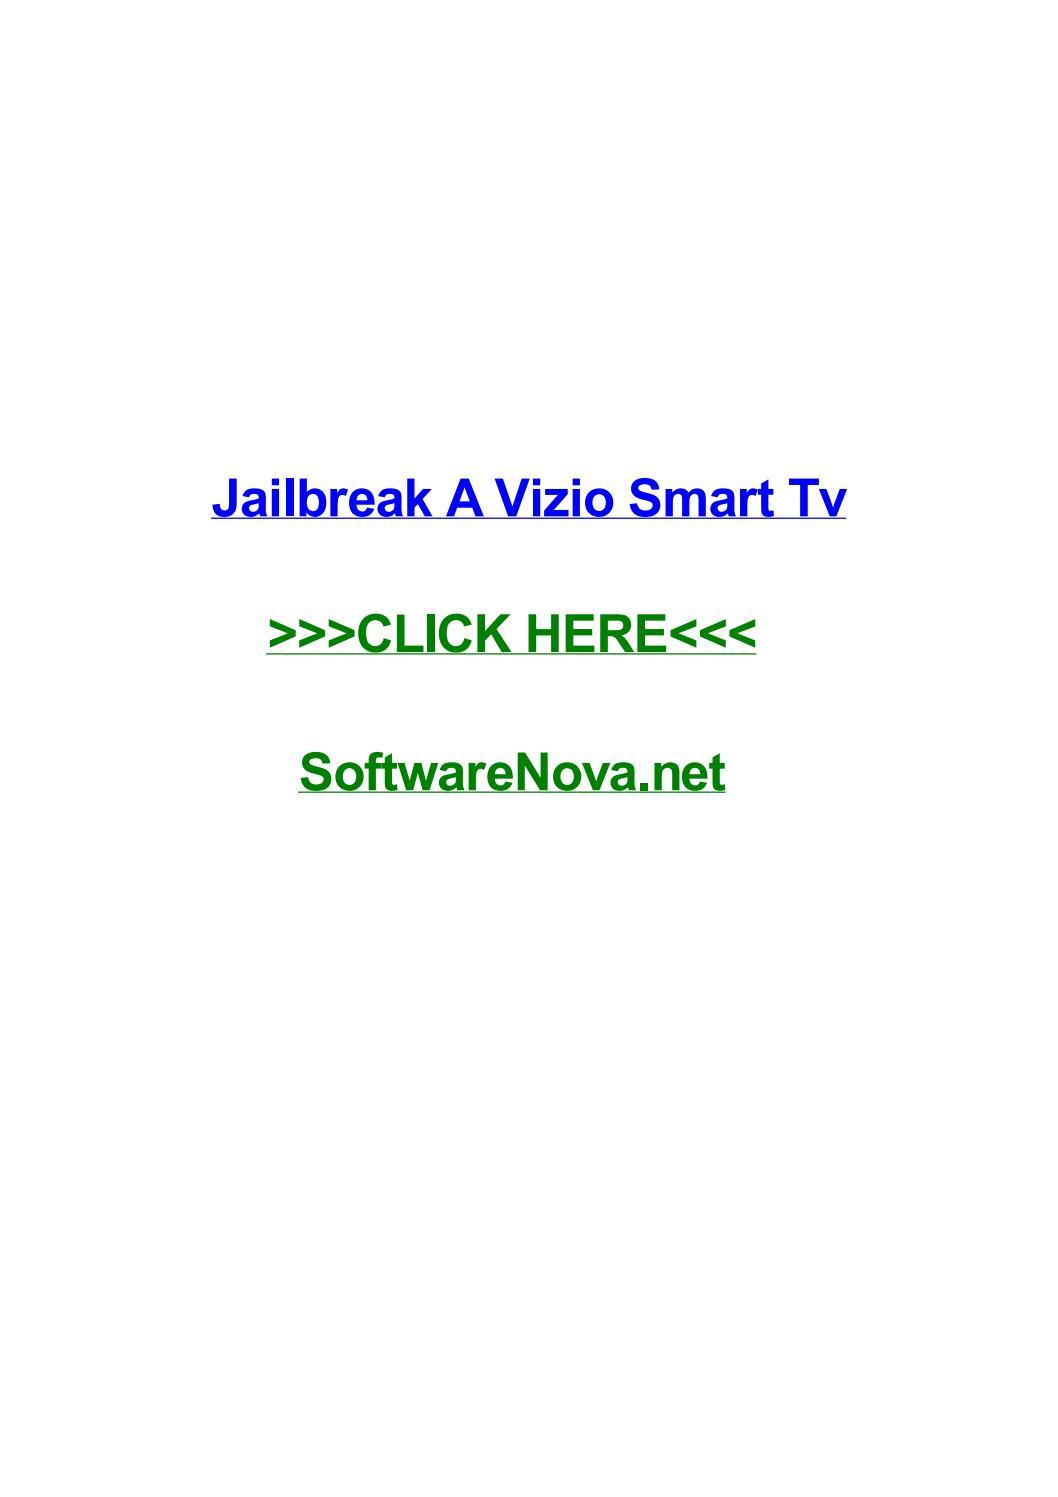 Jailbreak a vizio smart tv by crystalbgyq - issuu